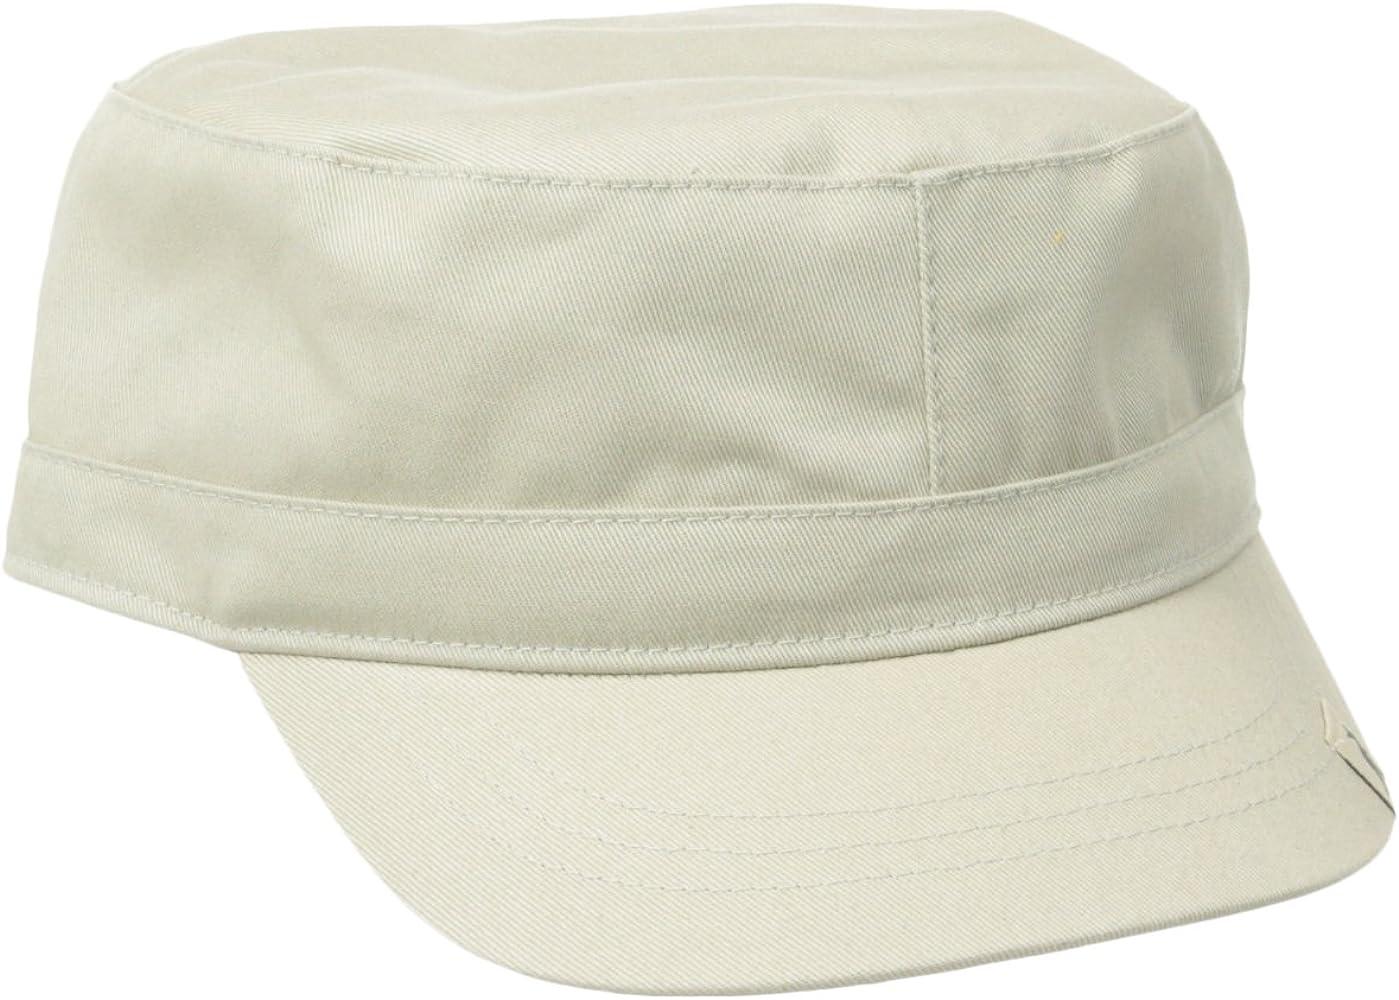 Kangol Headwear Cotton Adj Army Cap, Sombrero para Hombre, Beige ...